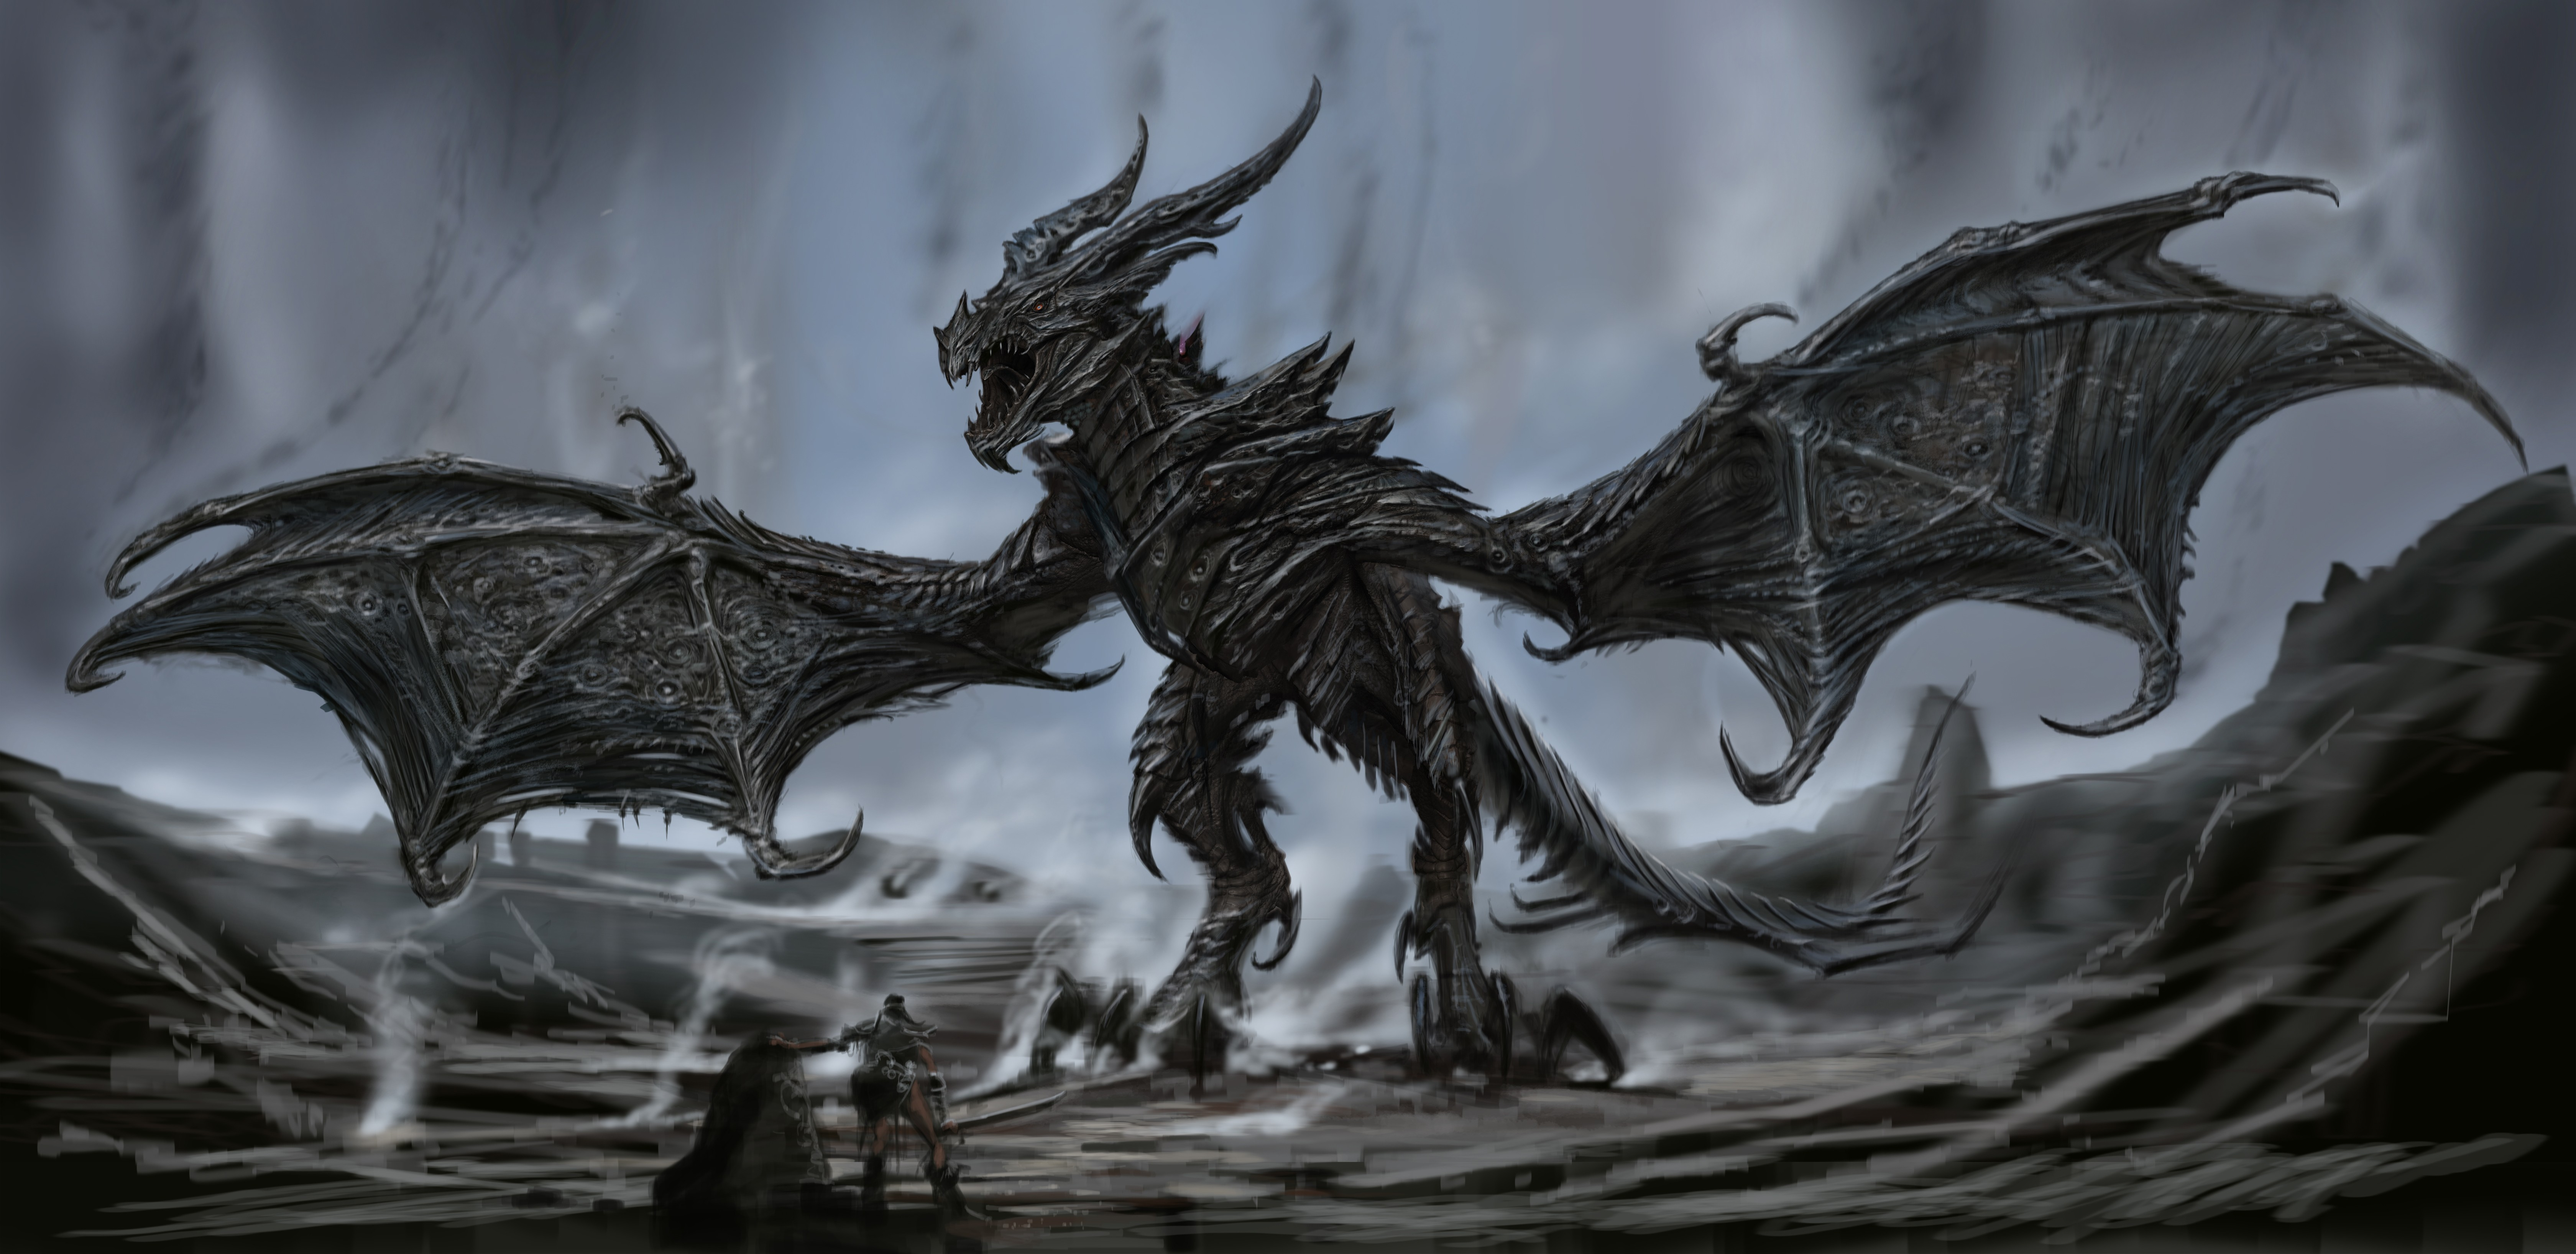 El monstruo imparable, K' de la Muerte Alduin_Body